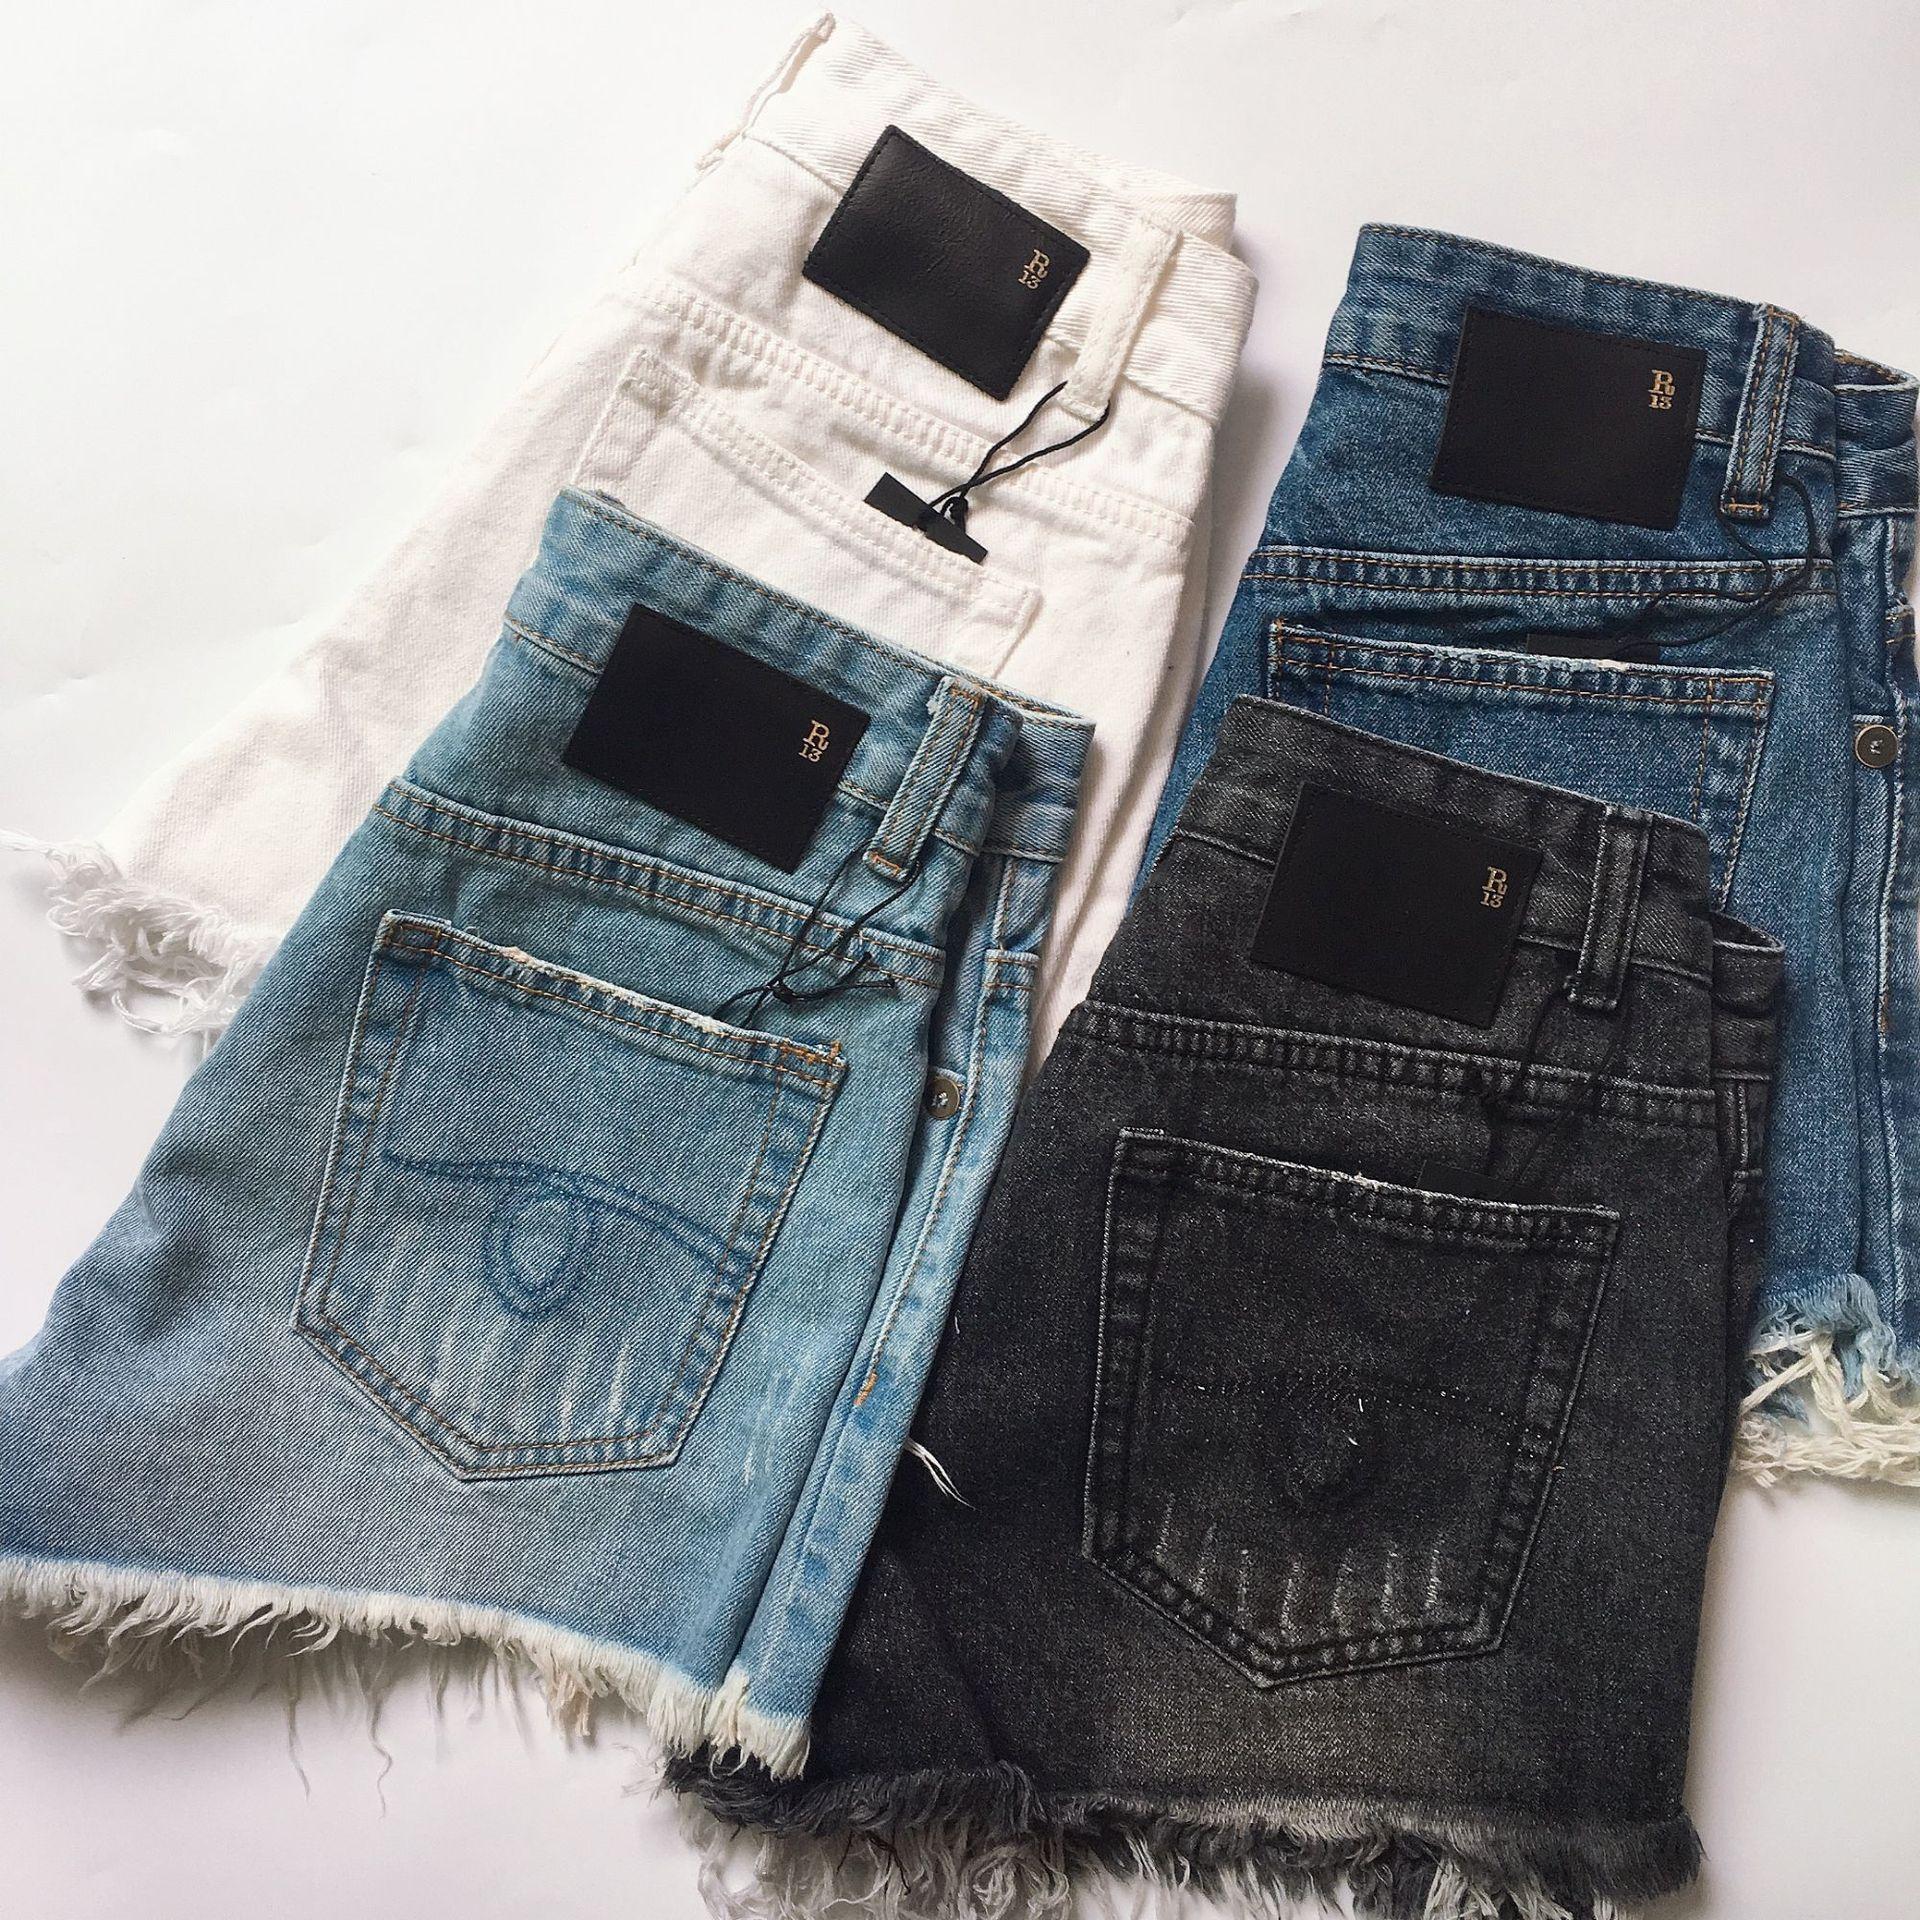 2020SS Verão cintura alta R13 Demin Shorts Mulheres Plus Size 5XL solto Buraco borlas Harajuku Hot Pants Sexy Jeans curto menina Primavera